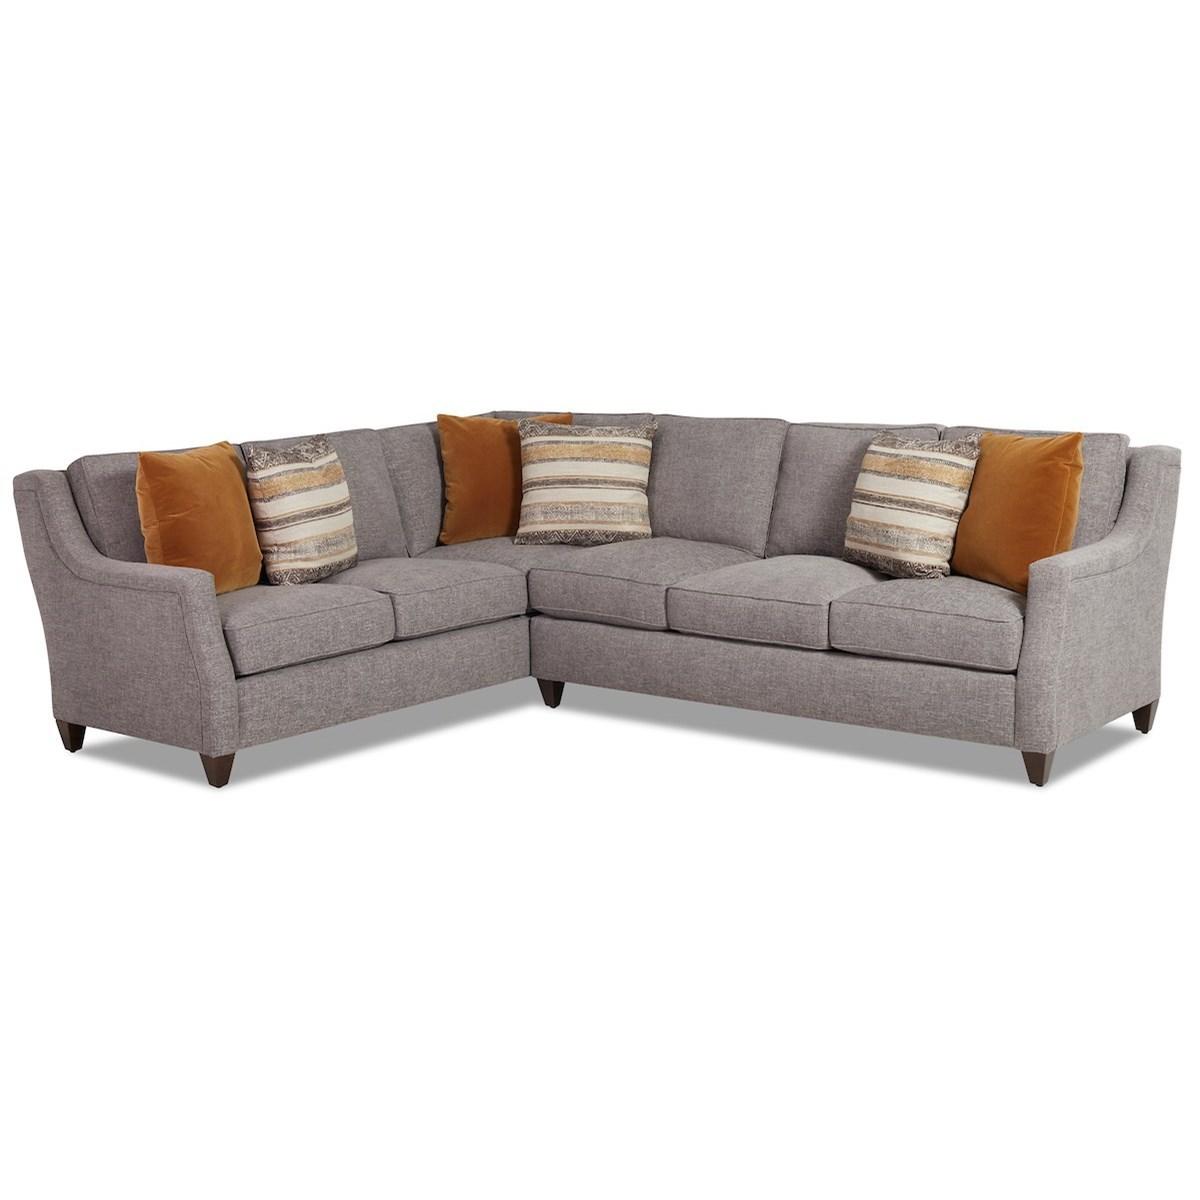 Gemma 5-Seat Sectional Sofa w/ LAF Corner Sofa by Klaussner at Lapeer Furniture & Mattress Center